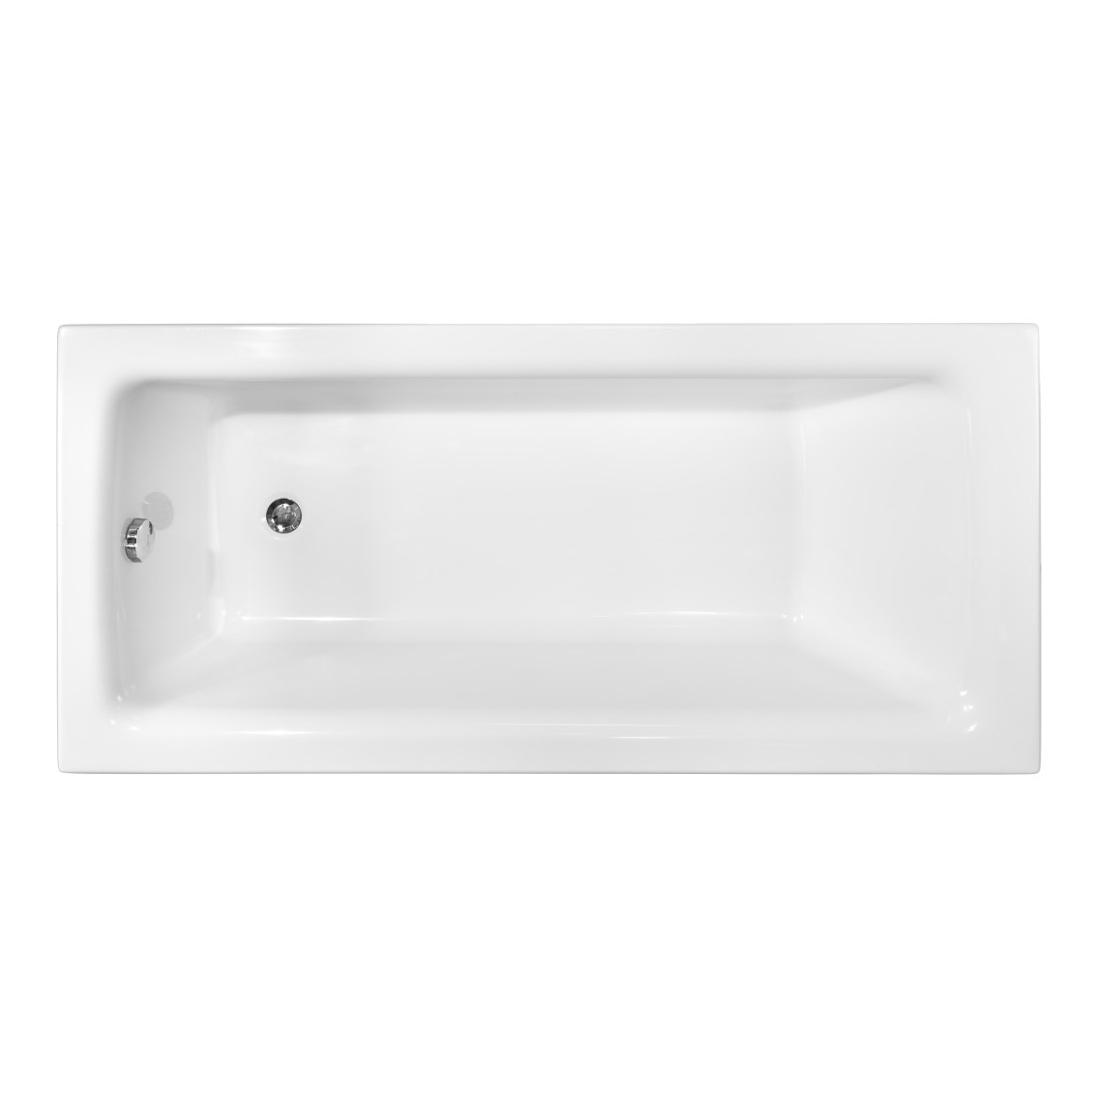 Акриловая ванна Besco Talia 140x70 цены онлайн